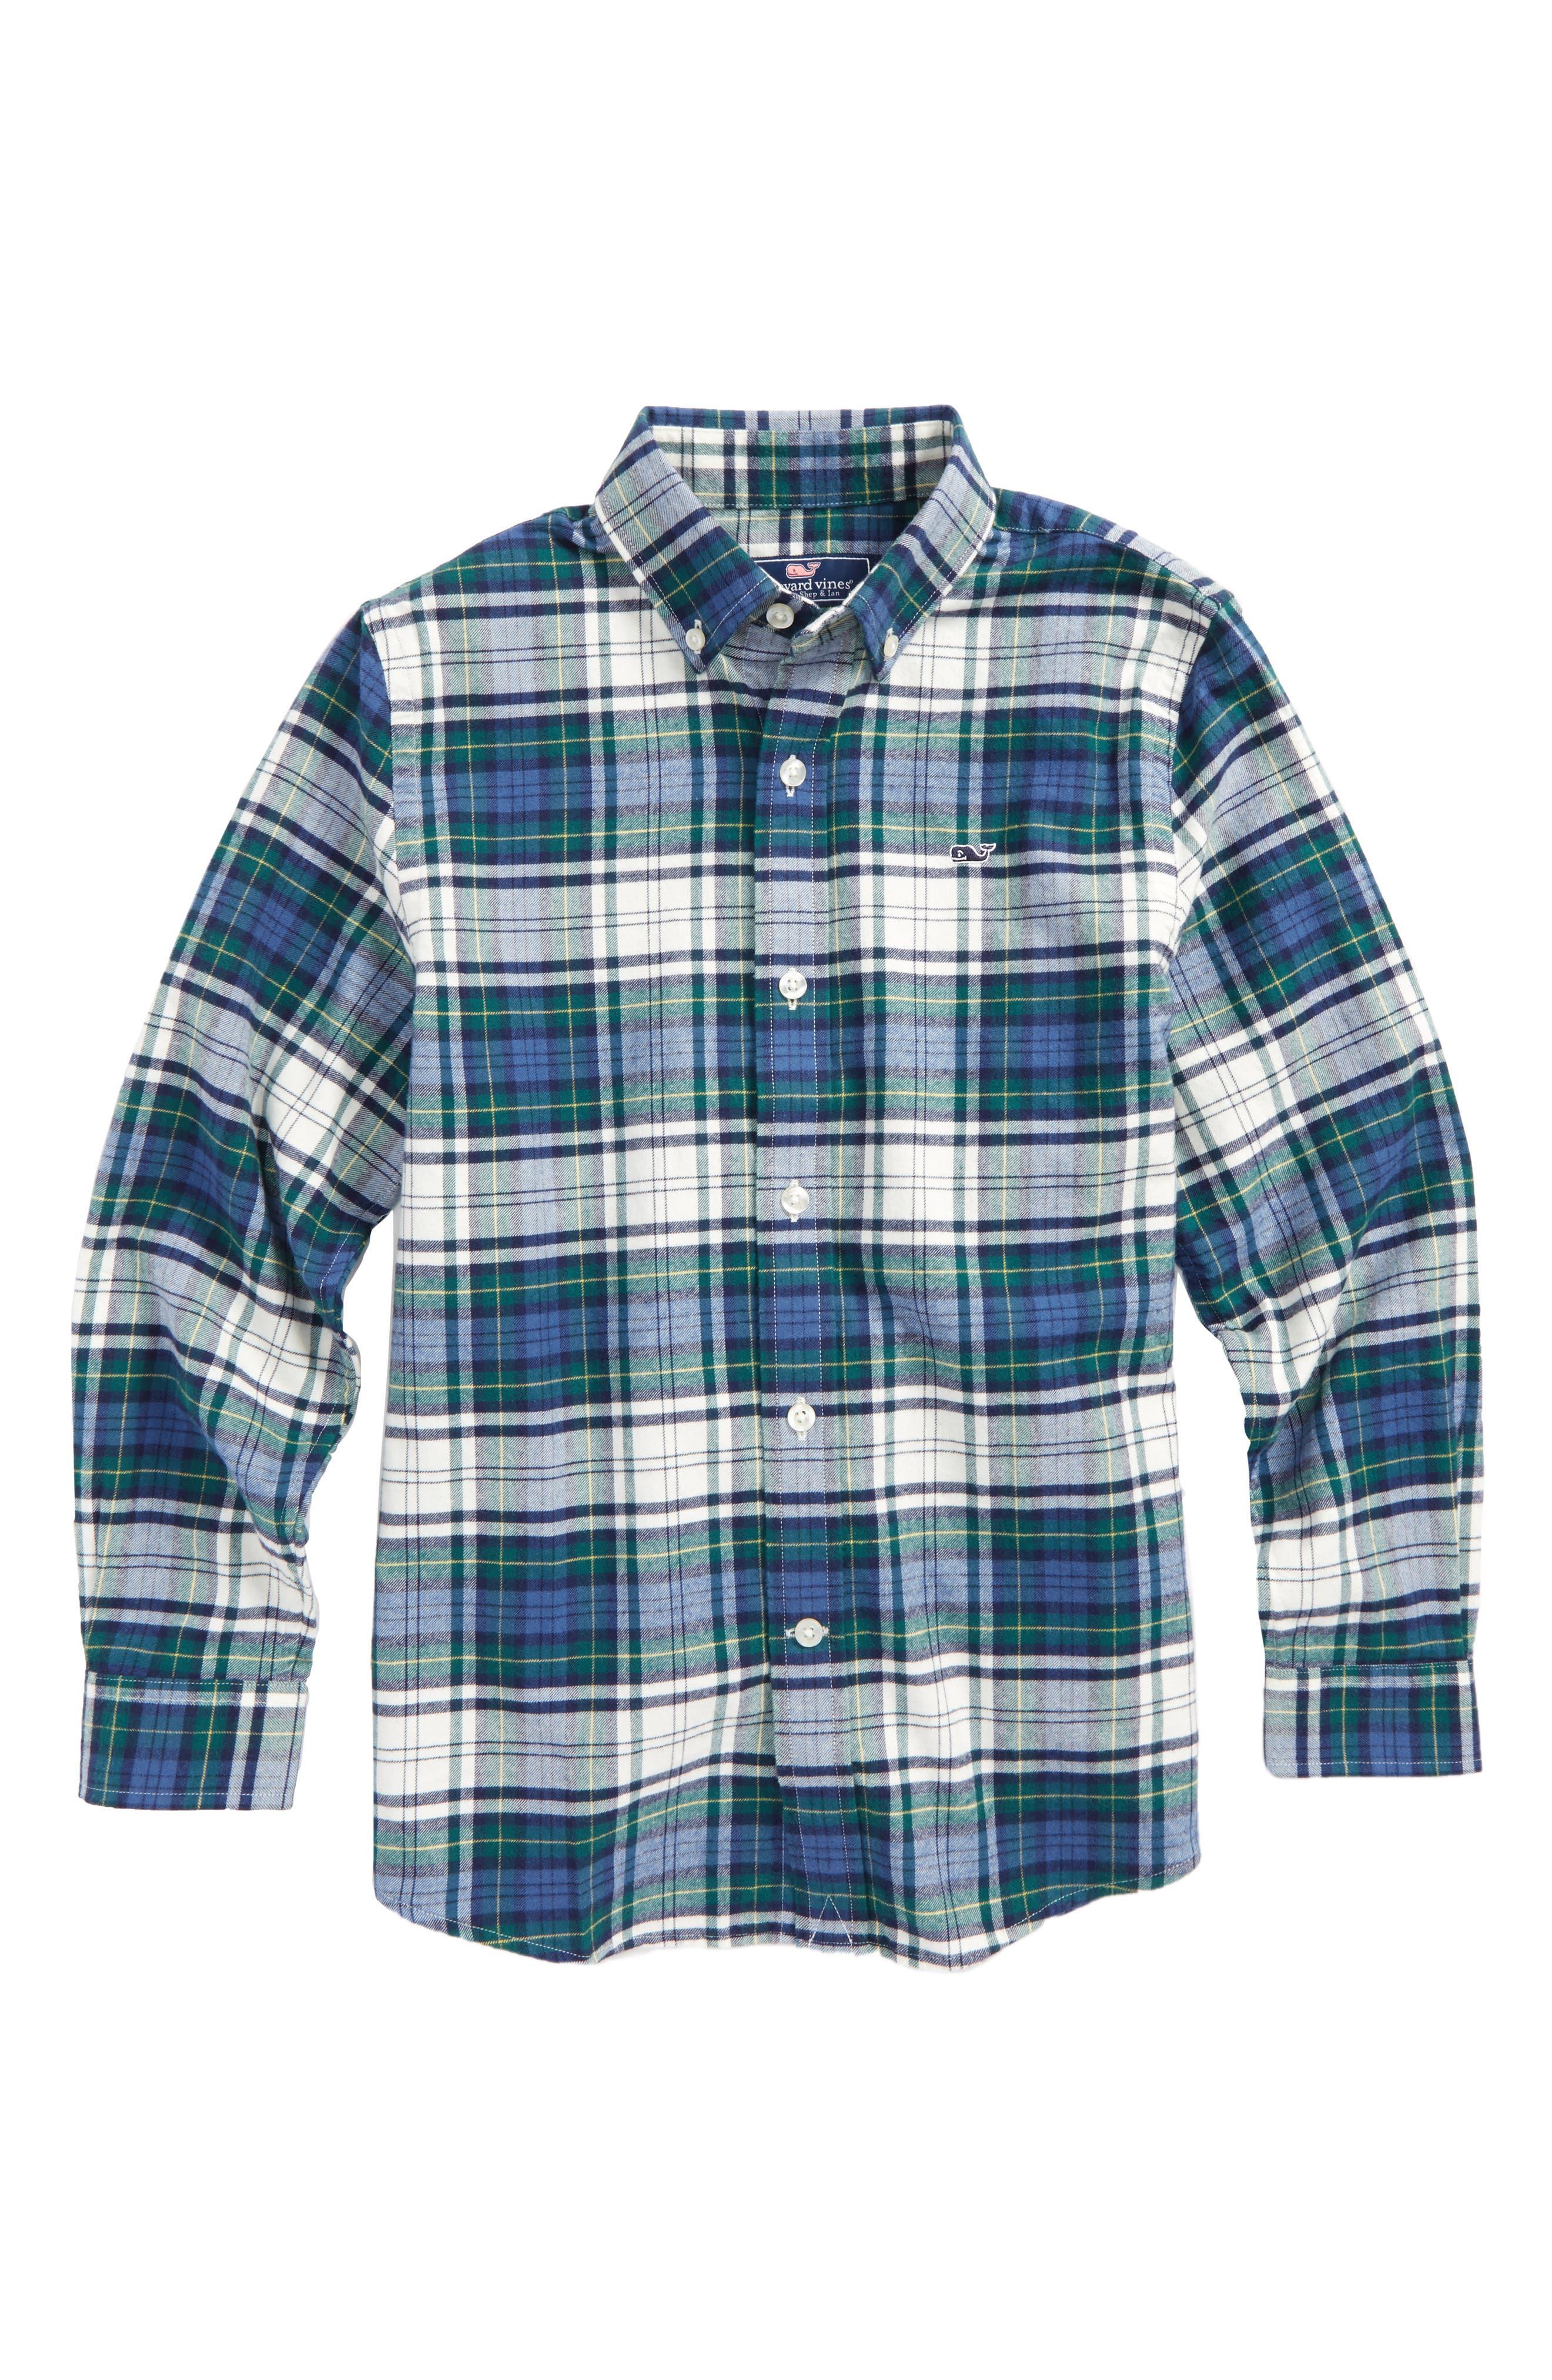 Main Image - vineyard vines Hayward Point Plaid Flannel Shirt (Toddler Boys, Little Boys & Big Boys)